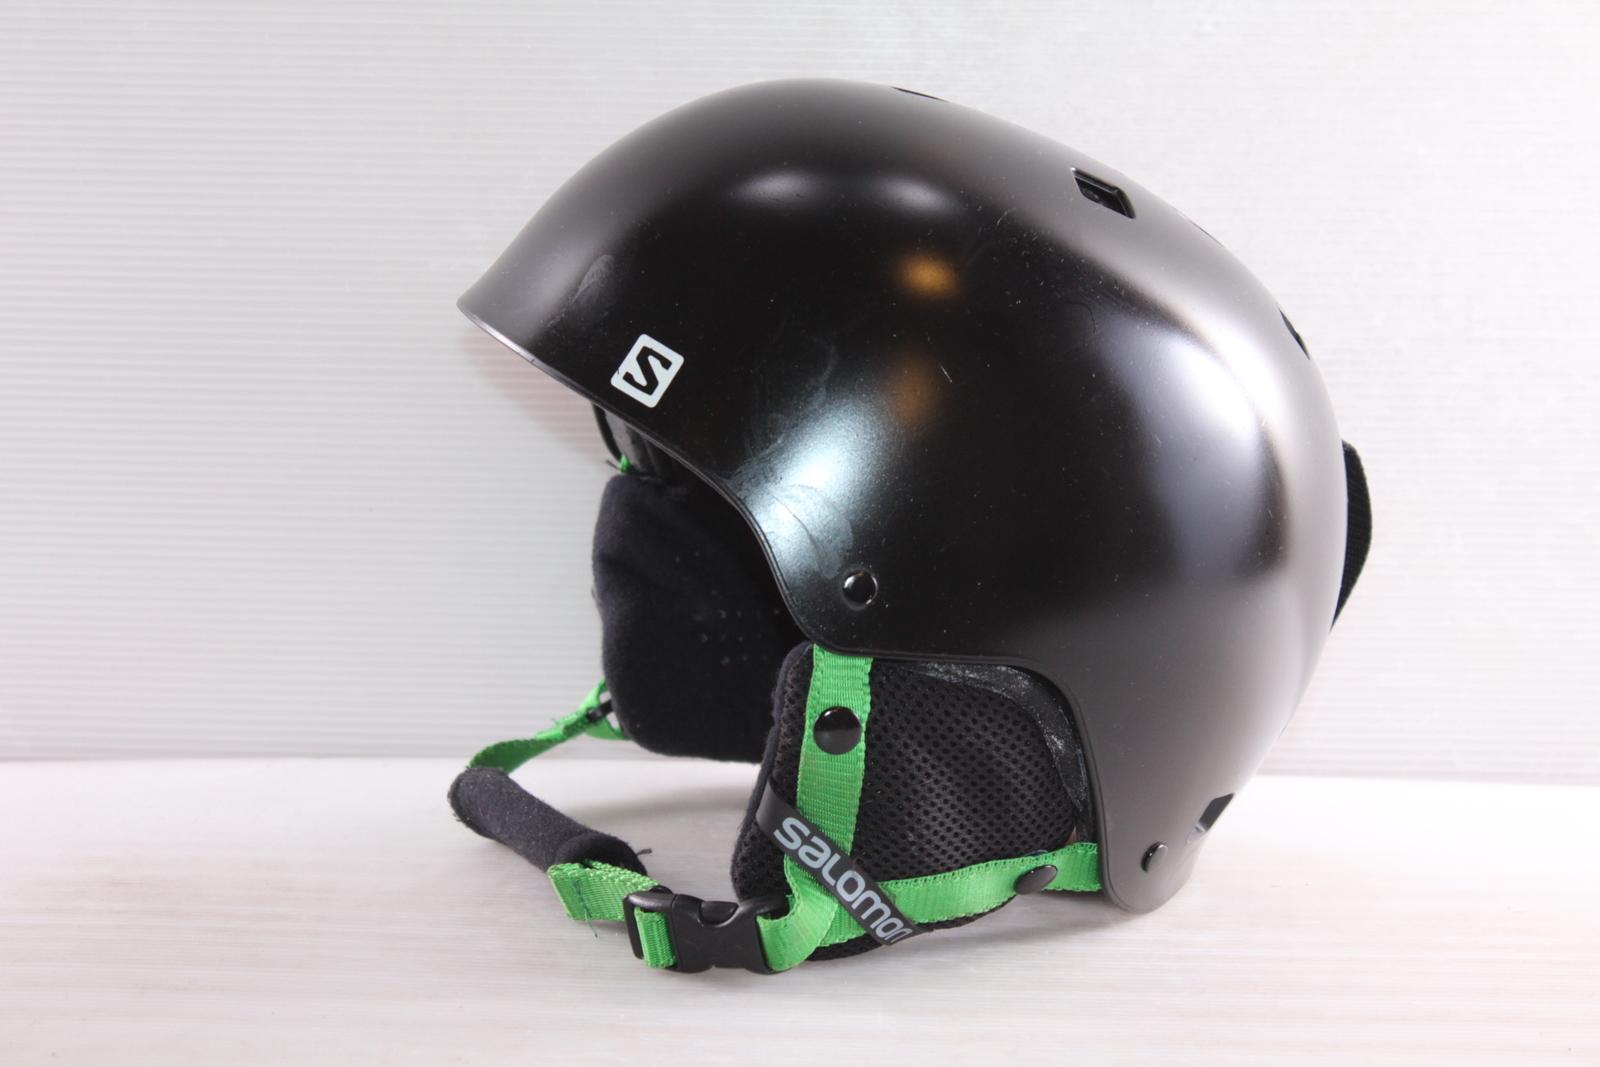 Dámská lyžařská helma Salomon Salomon - posuvná vel. 55 - 58